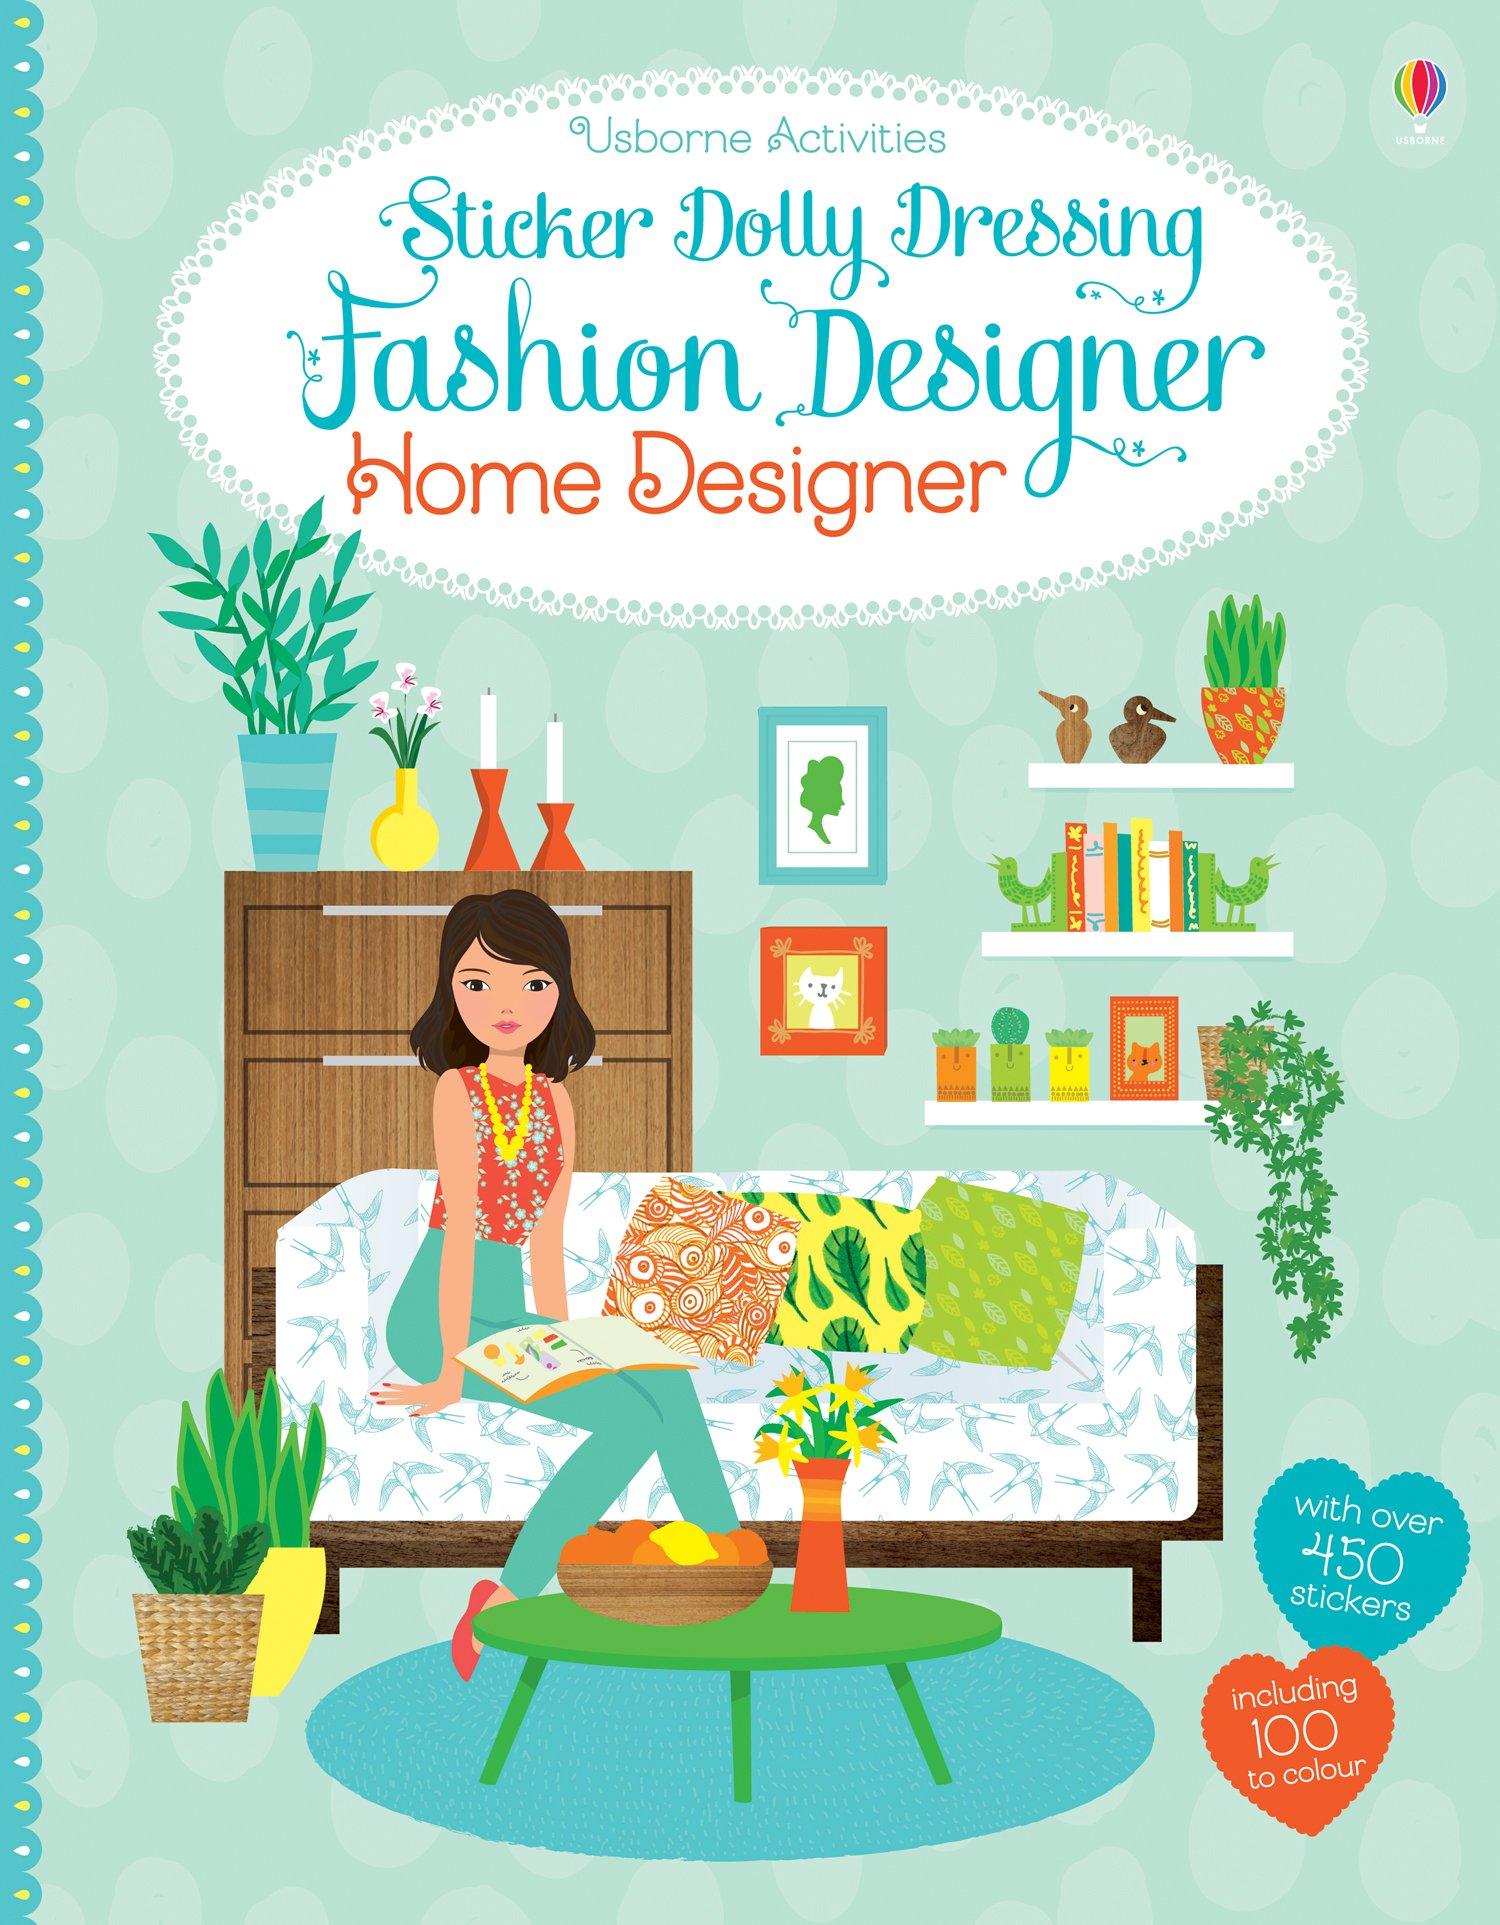 sticker dolly dressing fashion designer home designer emily bone sticker dolly dressing fashion designer home designer emily bone 9781409565154 amazon com books